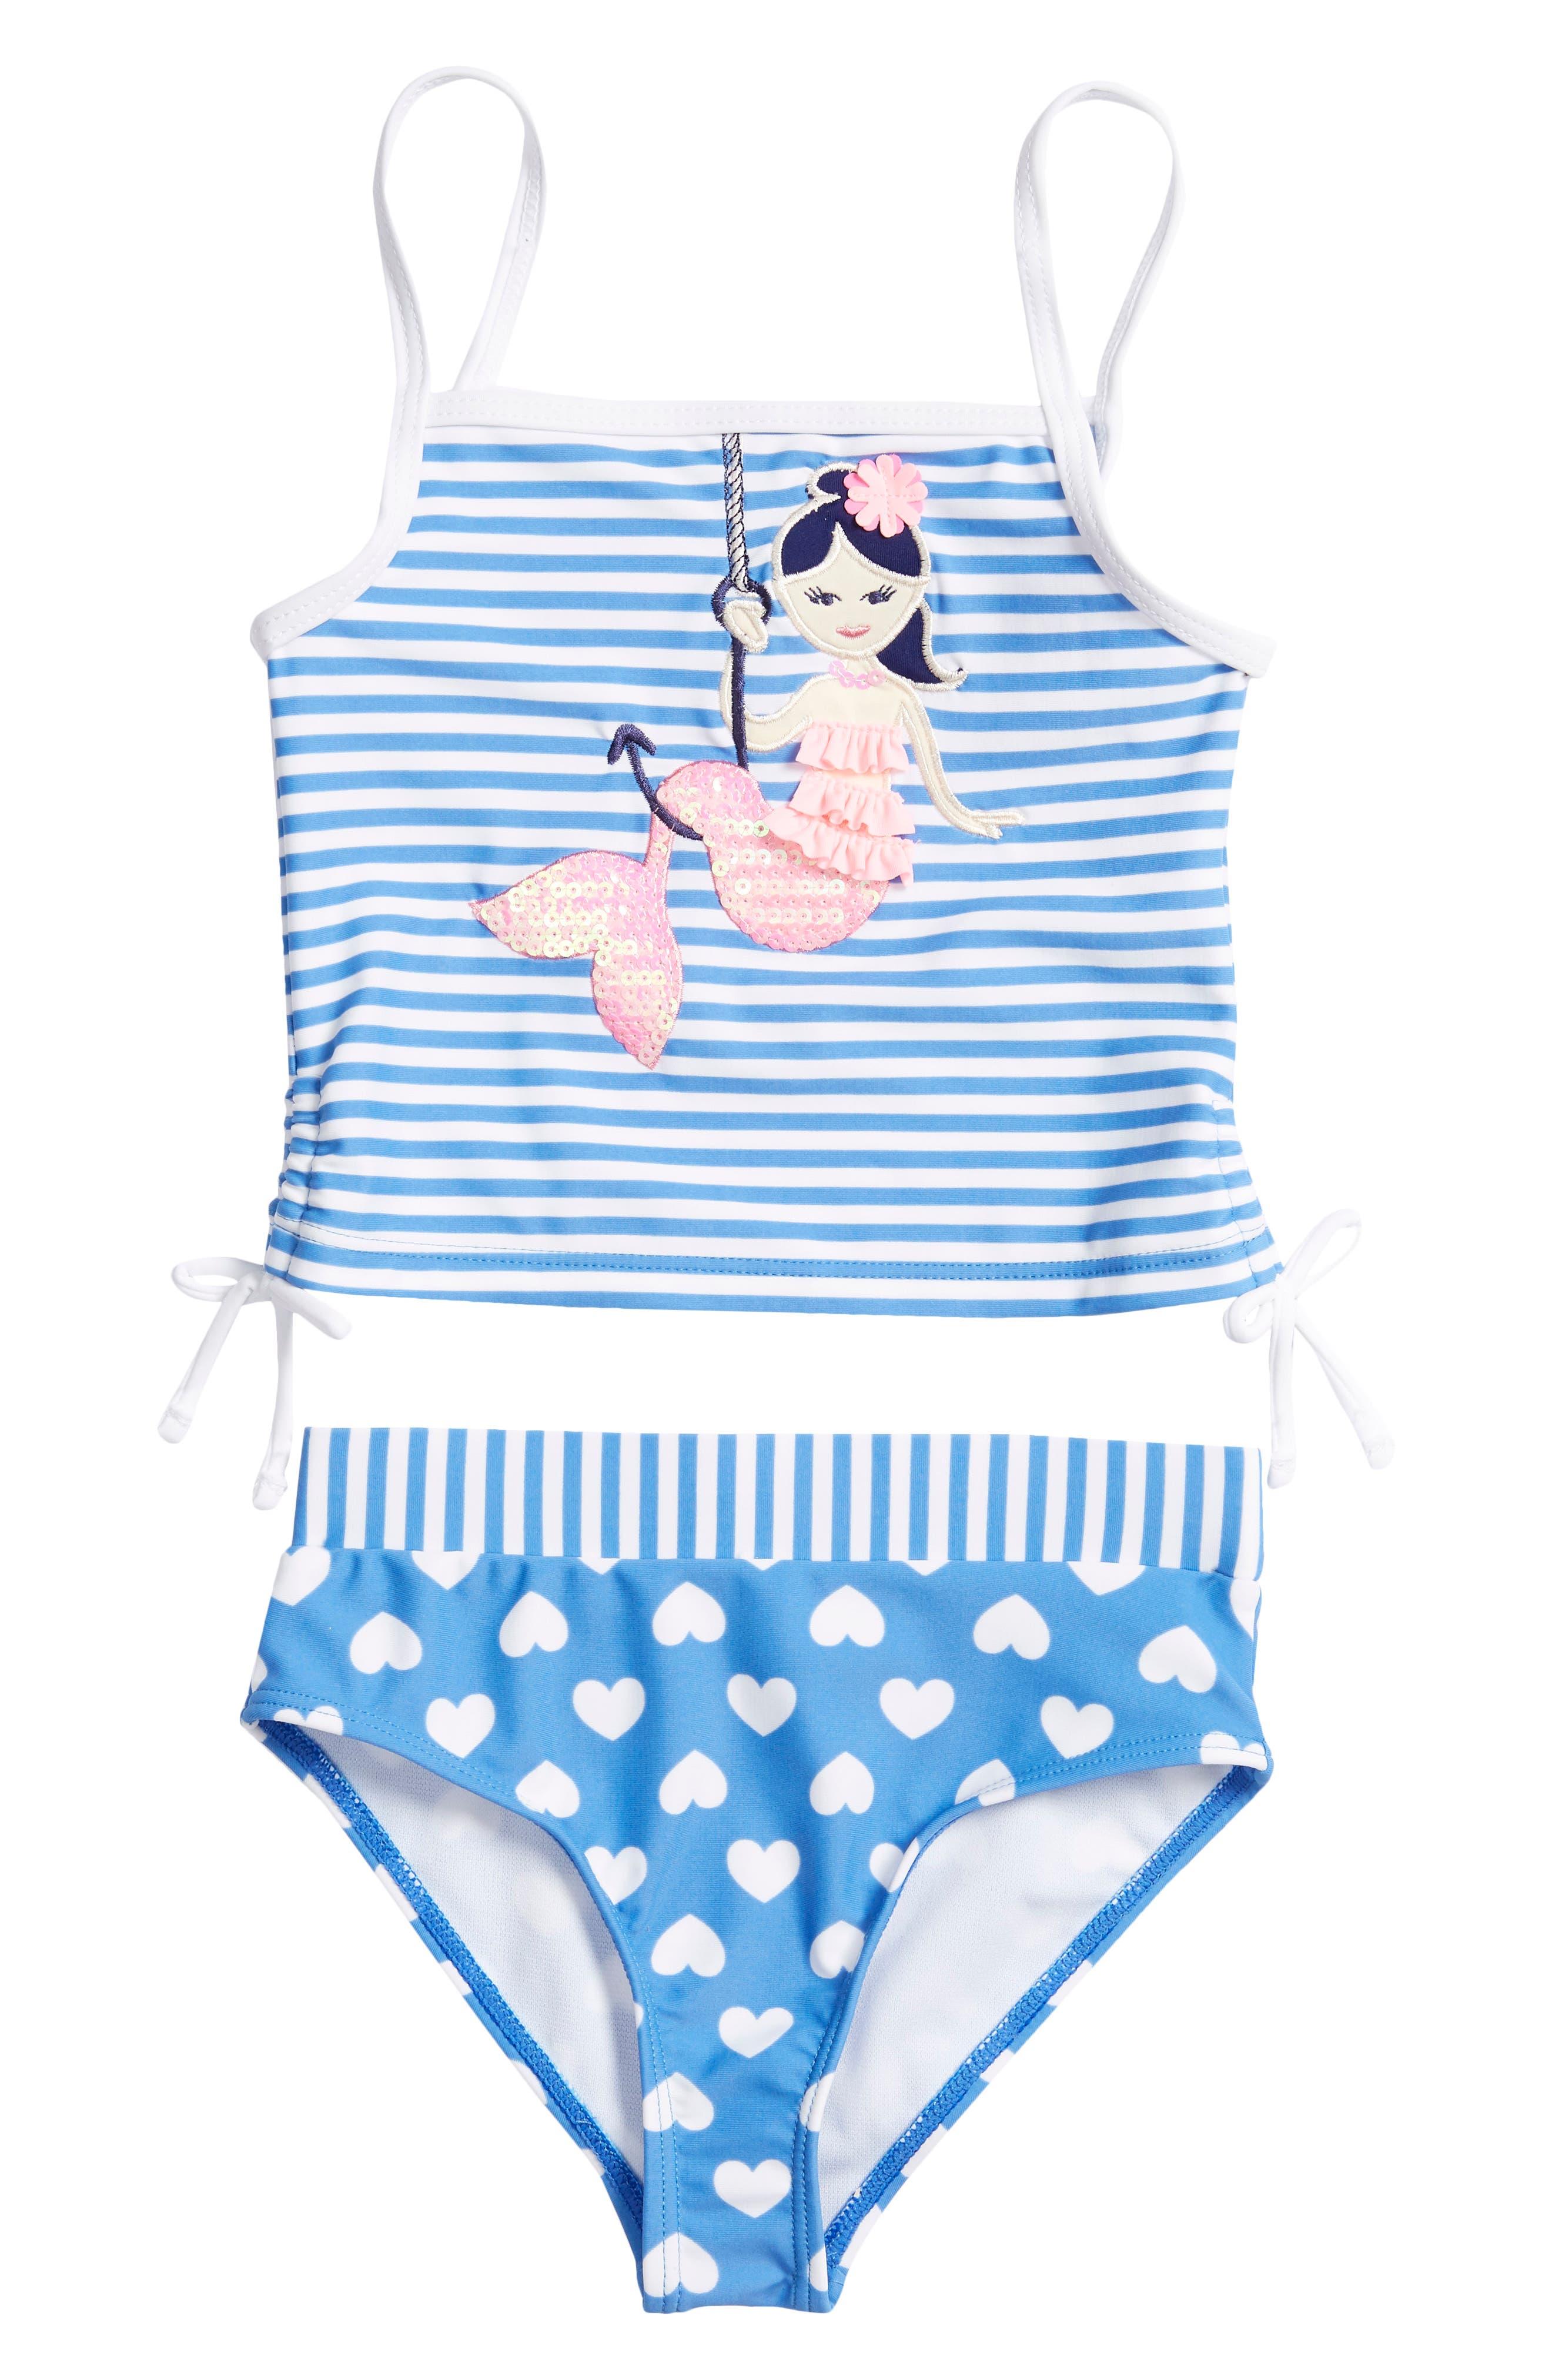 Image of Flapdoodles Mermaid Applique 2-Piece Swimsuit